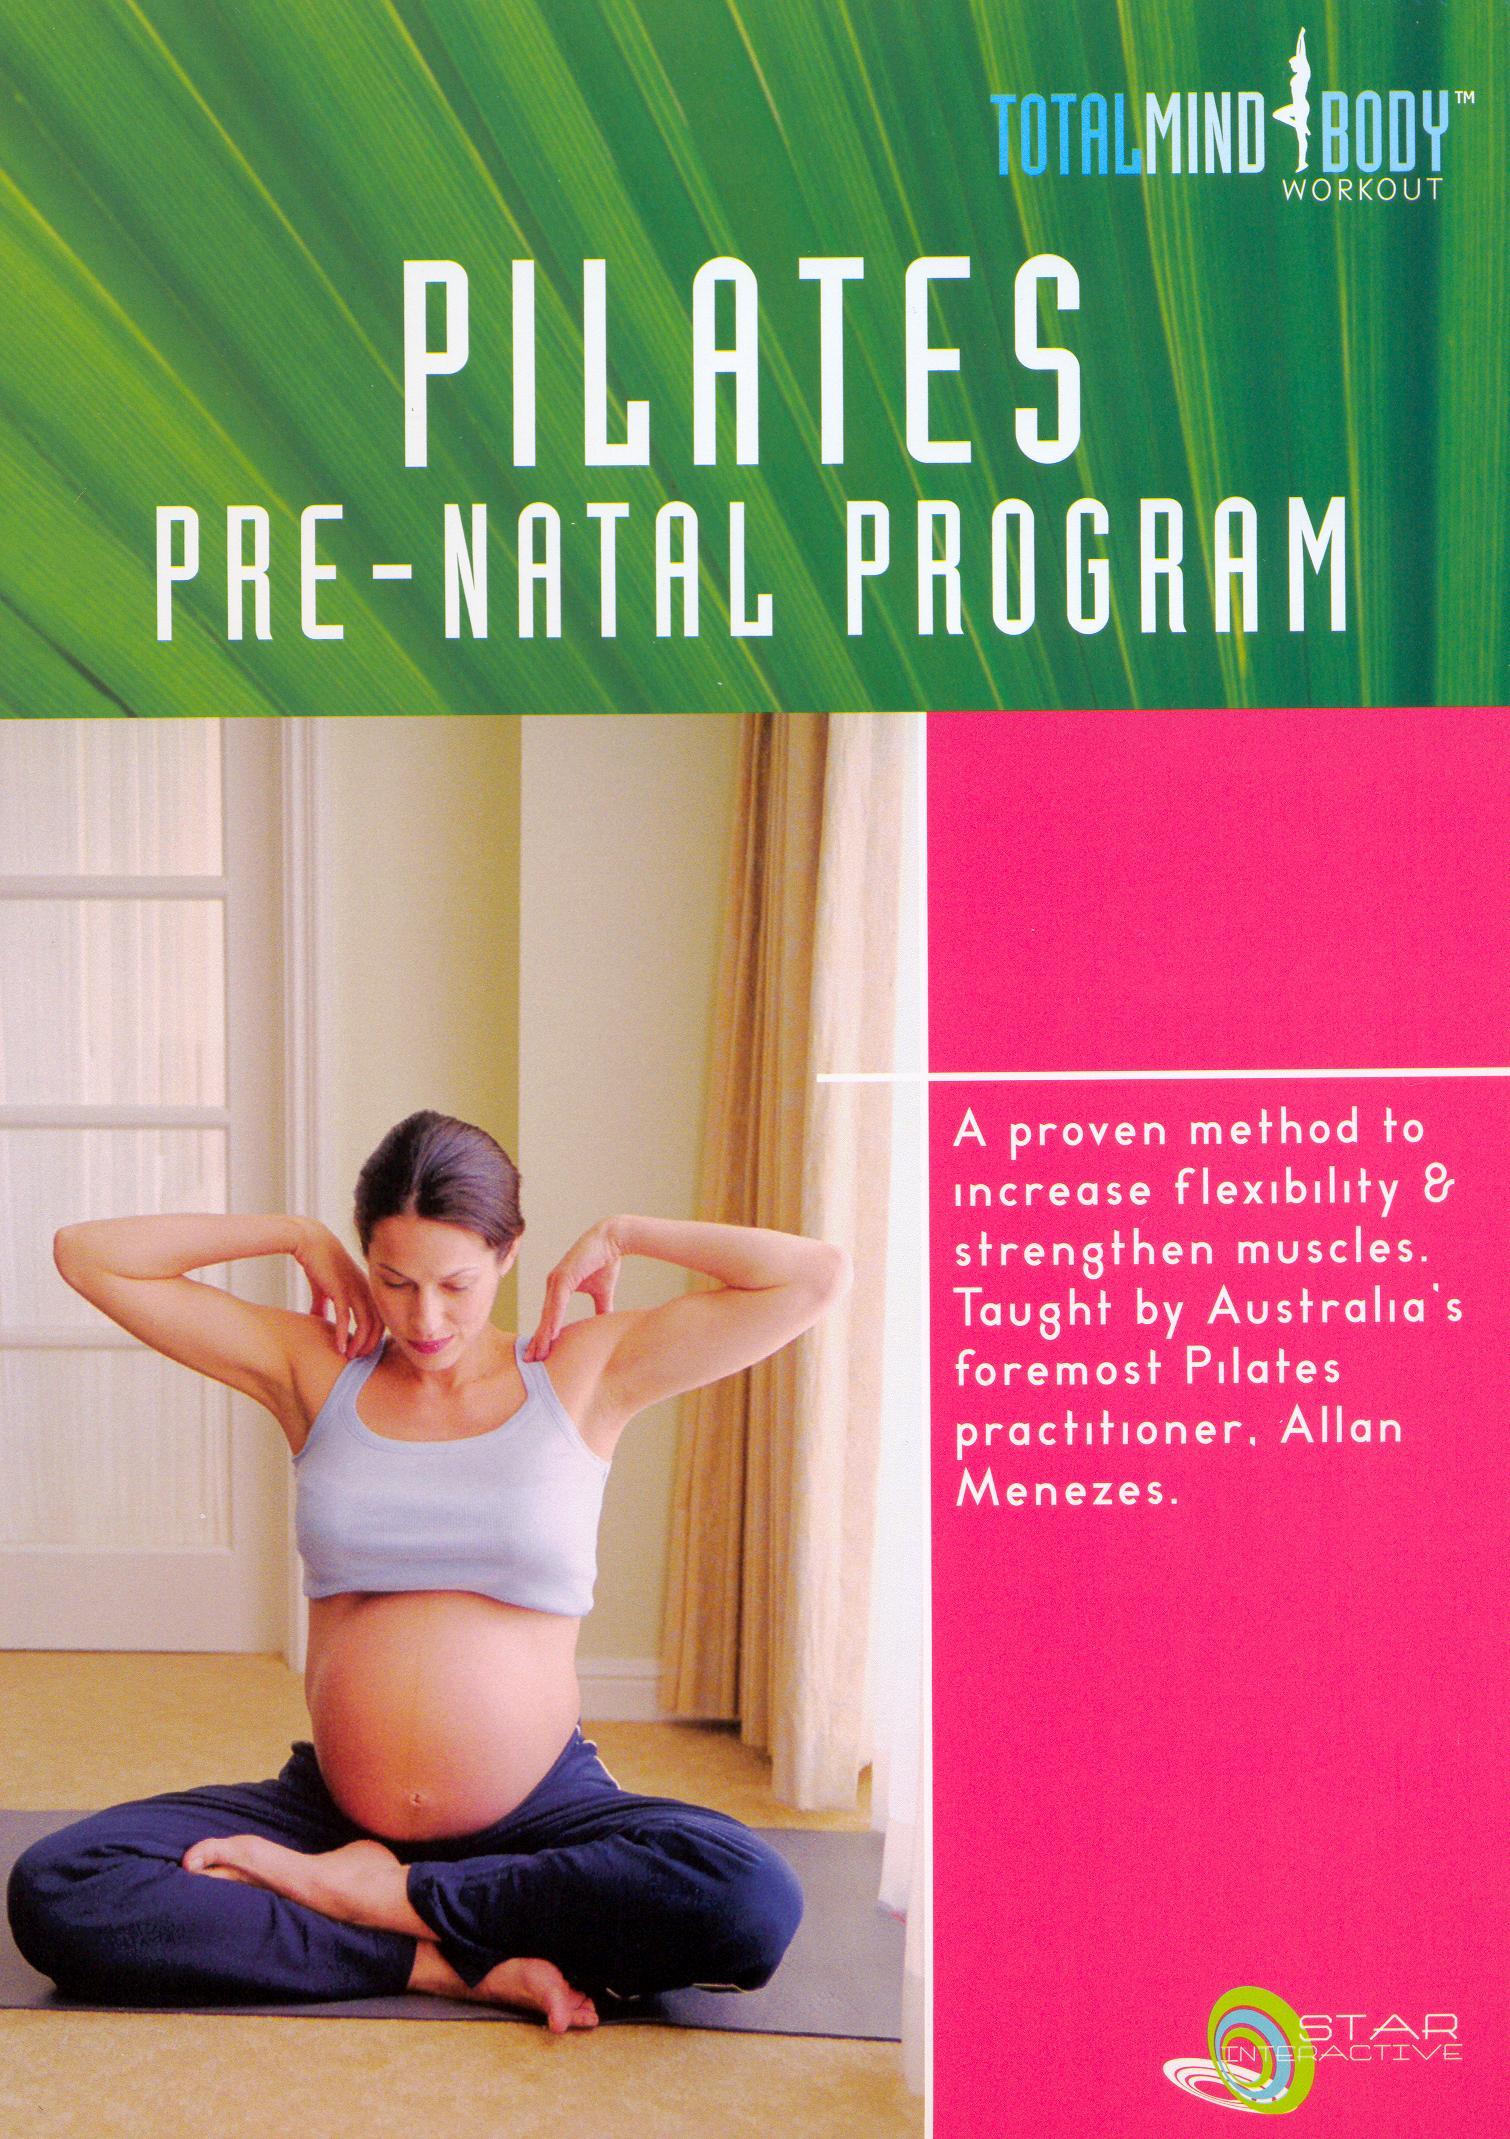 Pilates: Pre-Natal Program